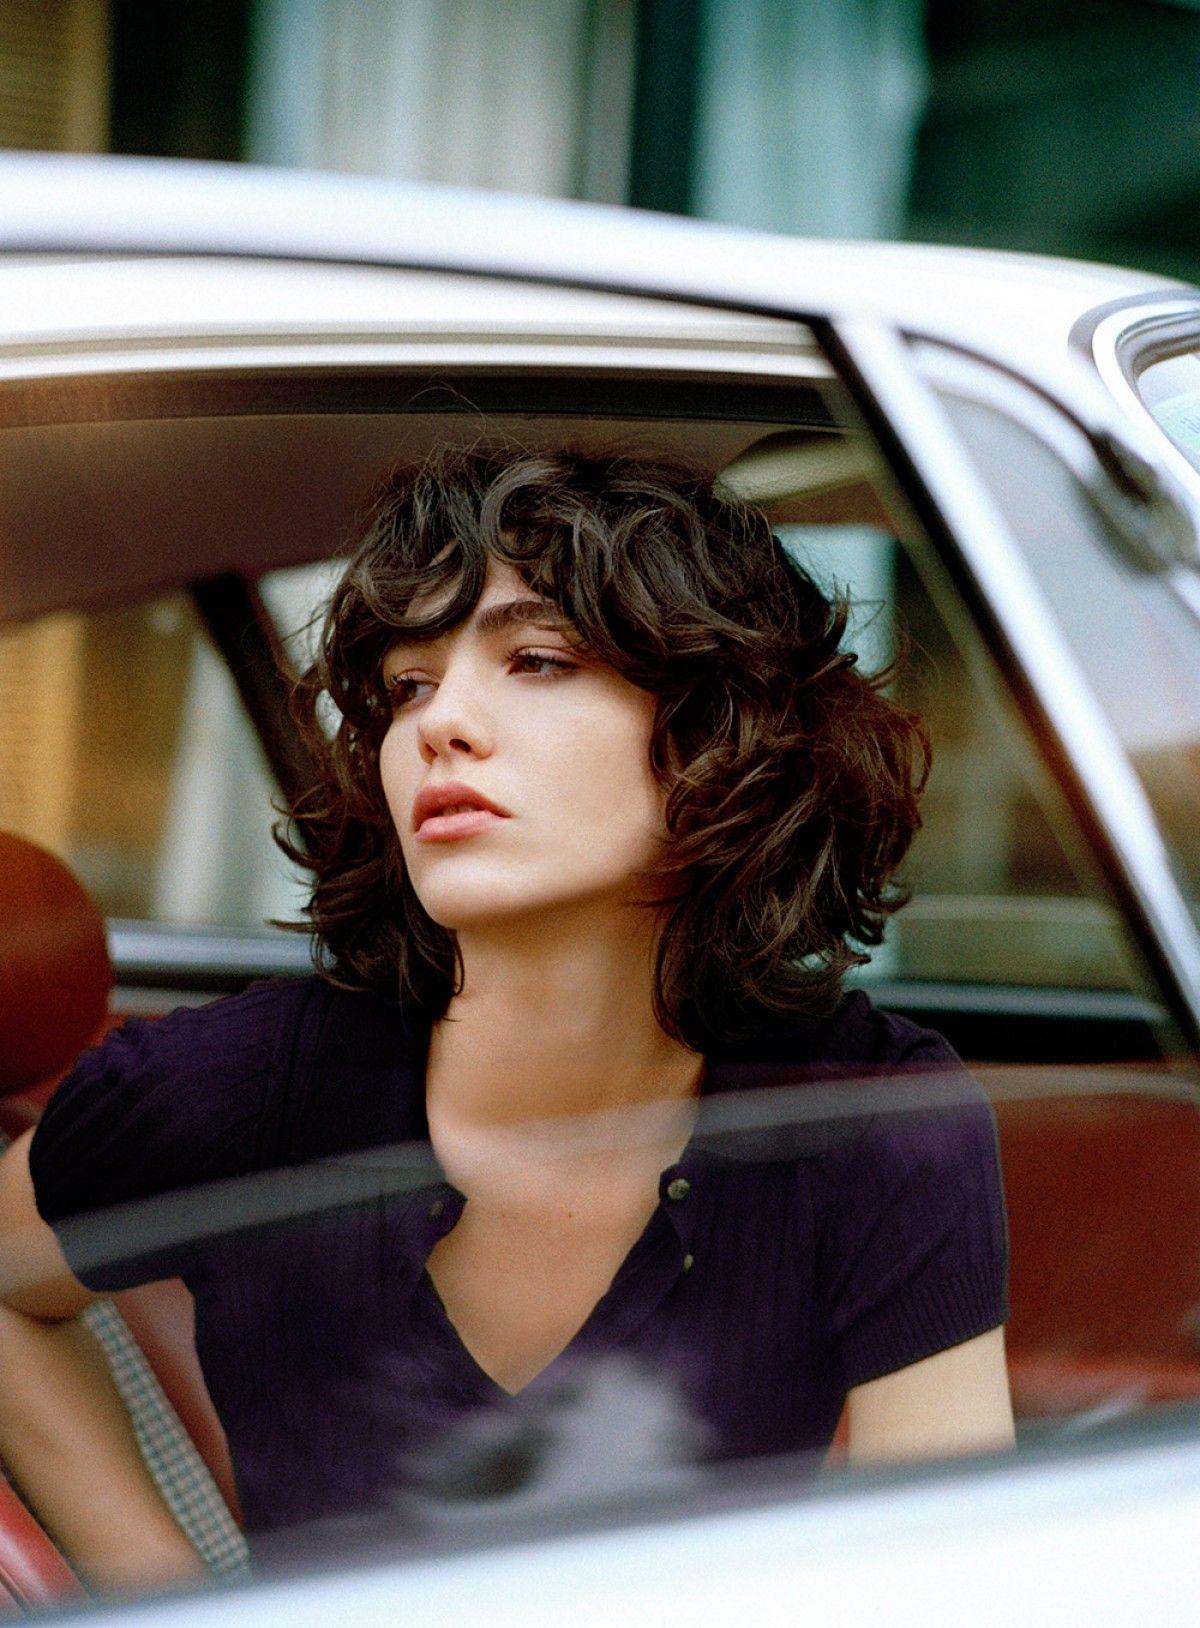 Damen  Katalog  World of Hair  Pinterest  Google Curly and Hair